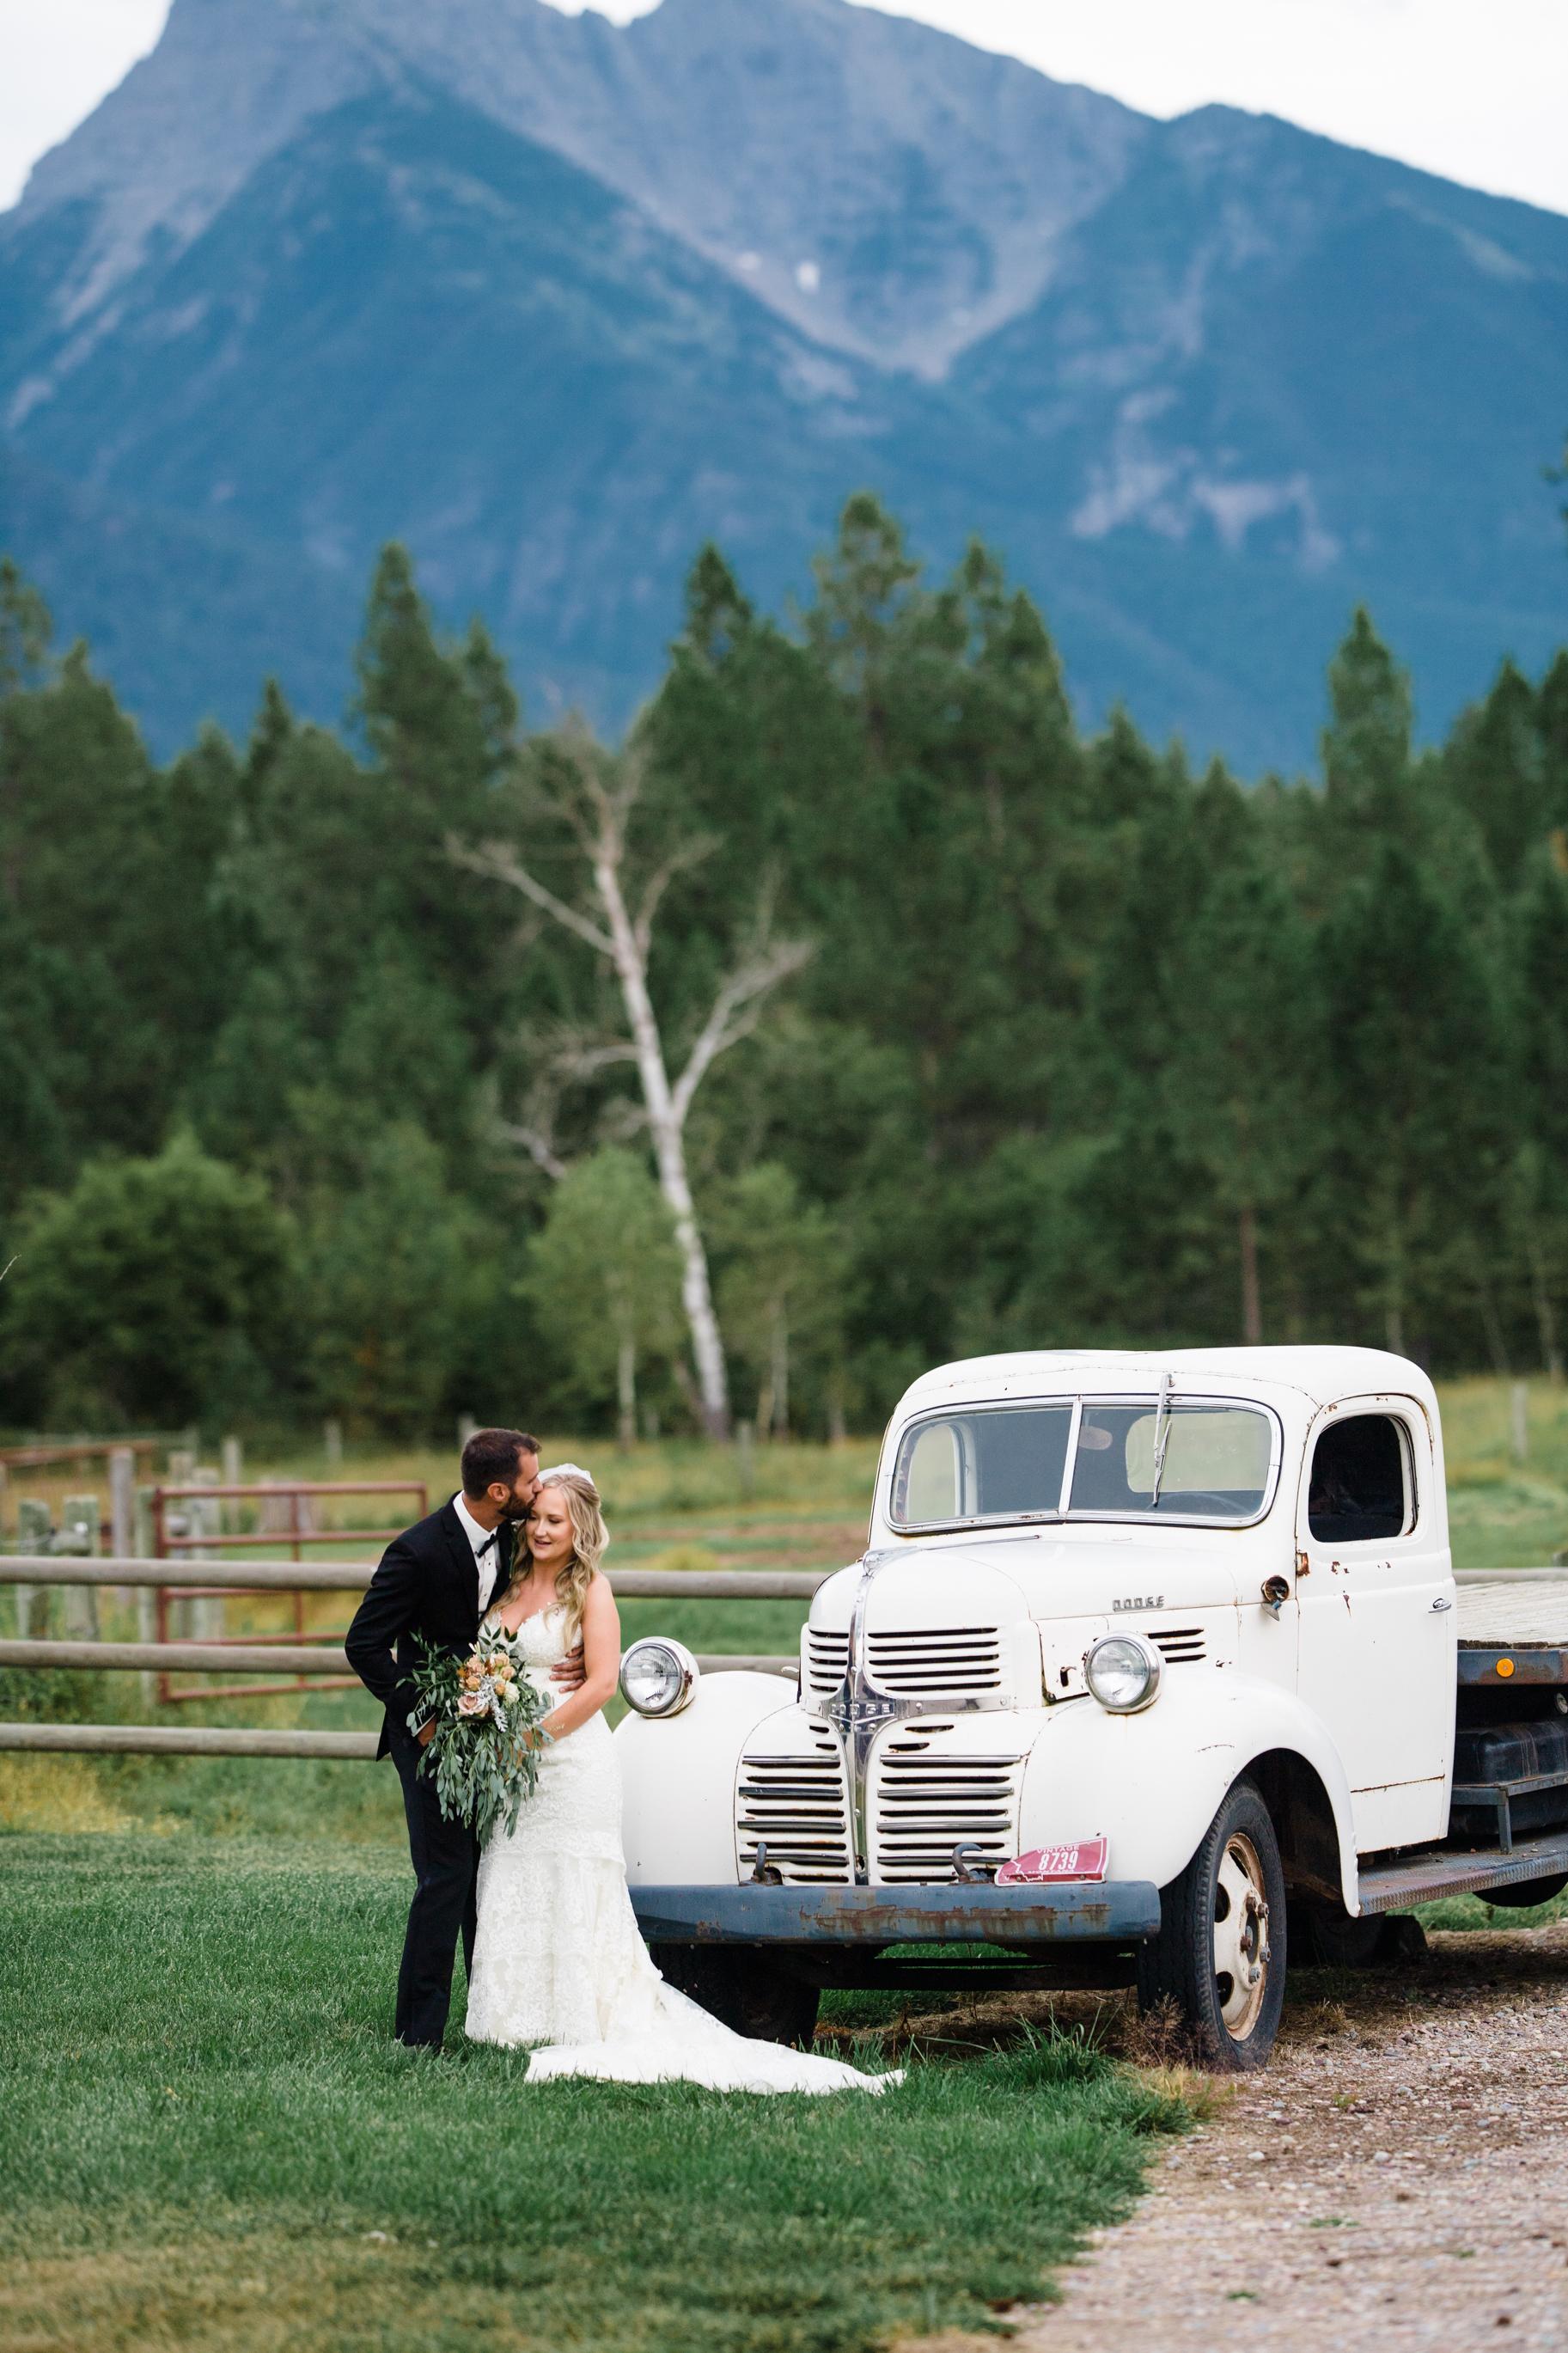 029Sky Ridge Ranch Wedding_Montana Wedding Photographer_Jessica & Brian_Honeybee Weddings_August 24, 2019-18.jpg